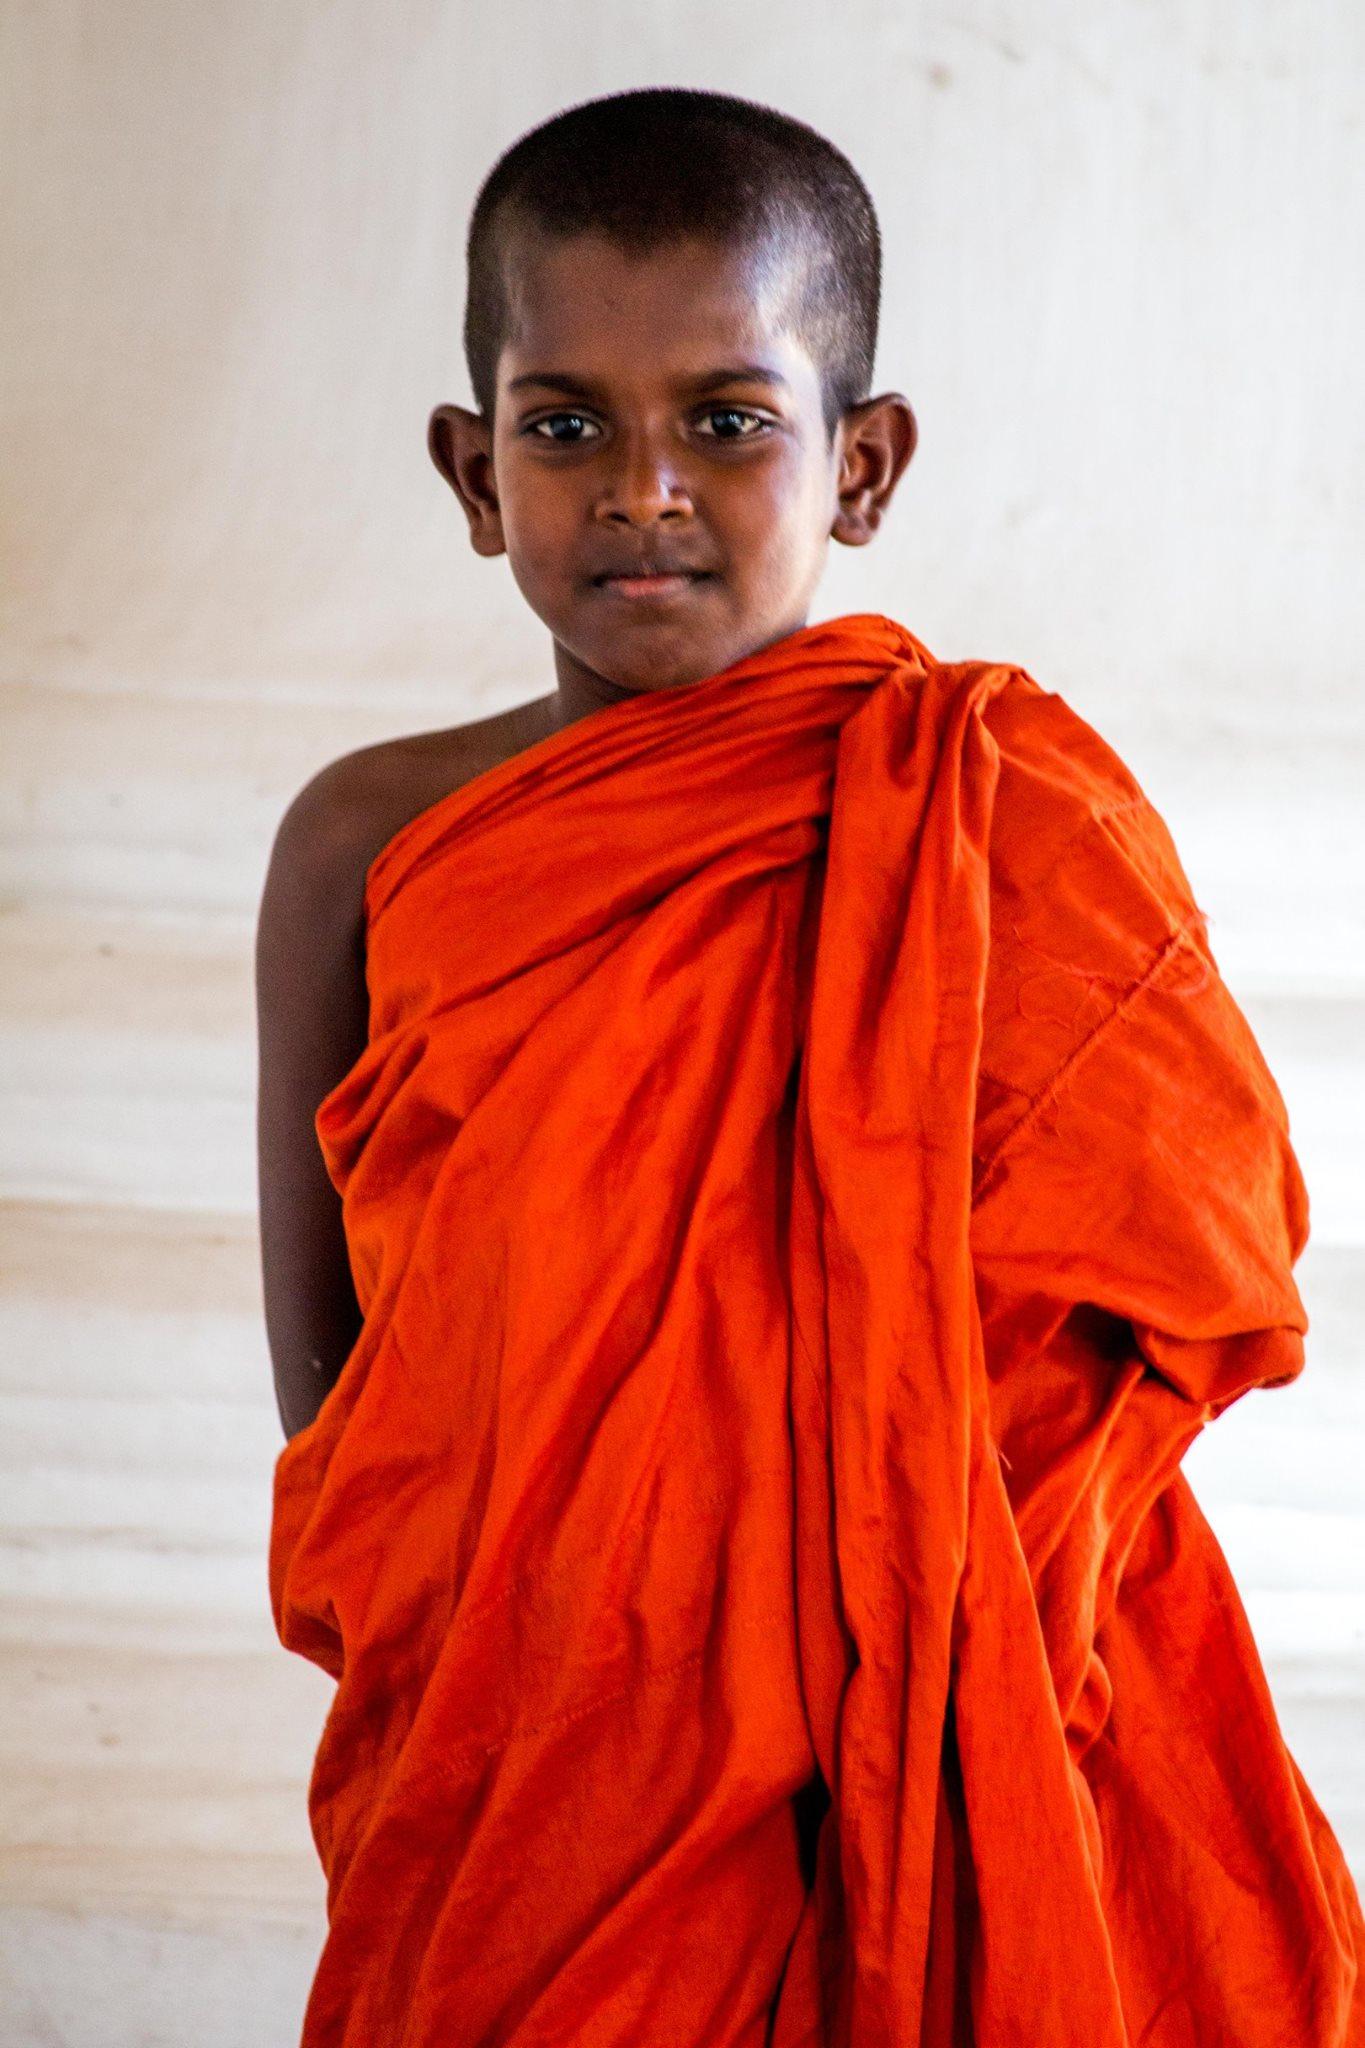 invite-to-paradise-sri-lanka-and-maldives-specialists-travel-agent-tour-operator-customer-review--feedback-joel-rhian-monk-2.jpg